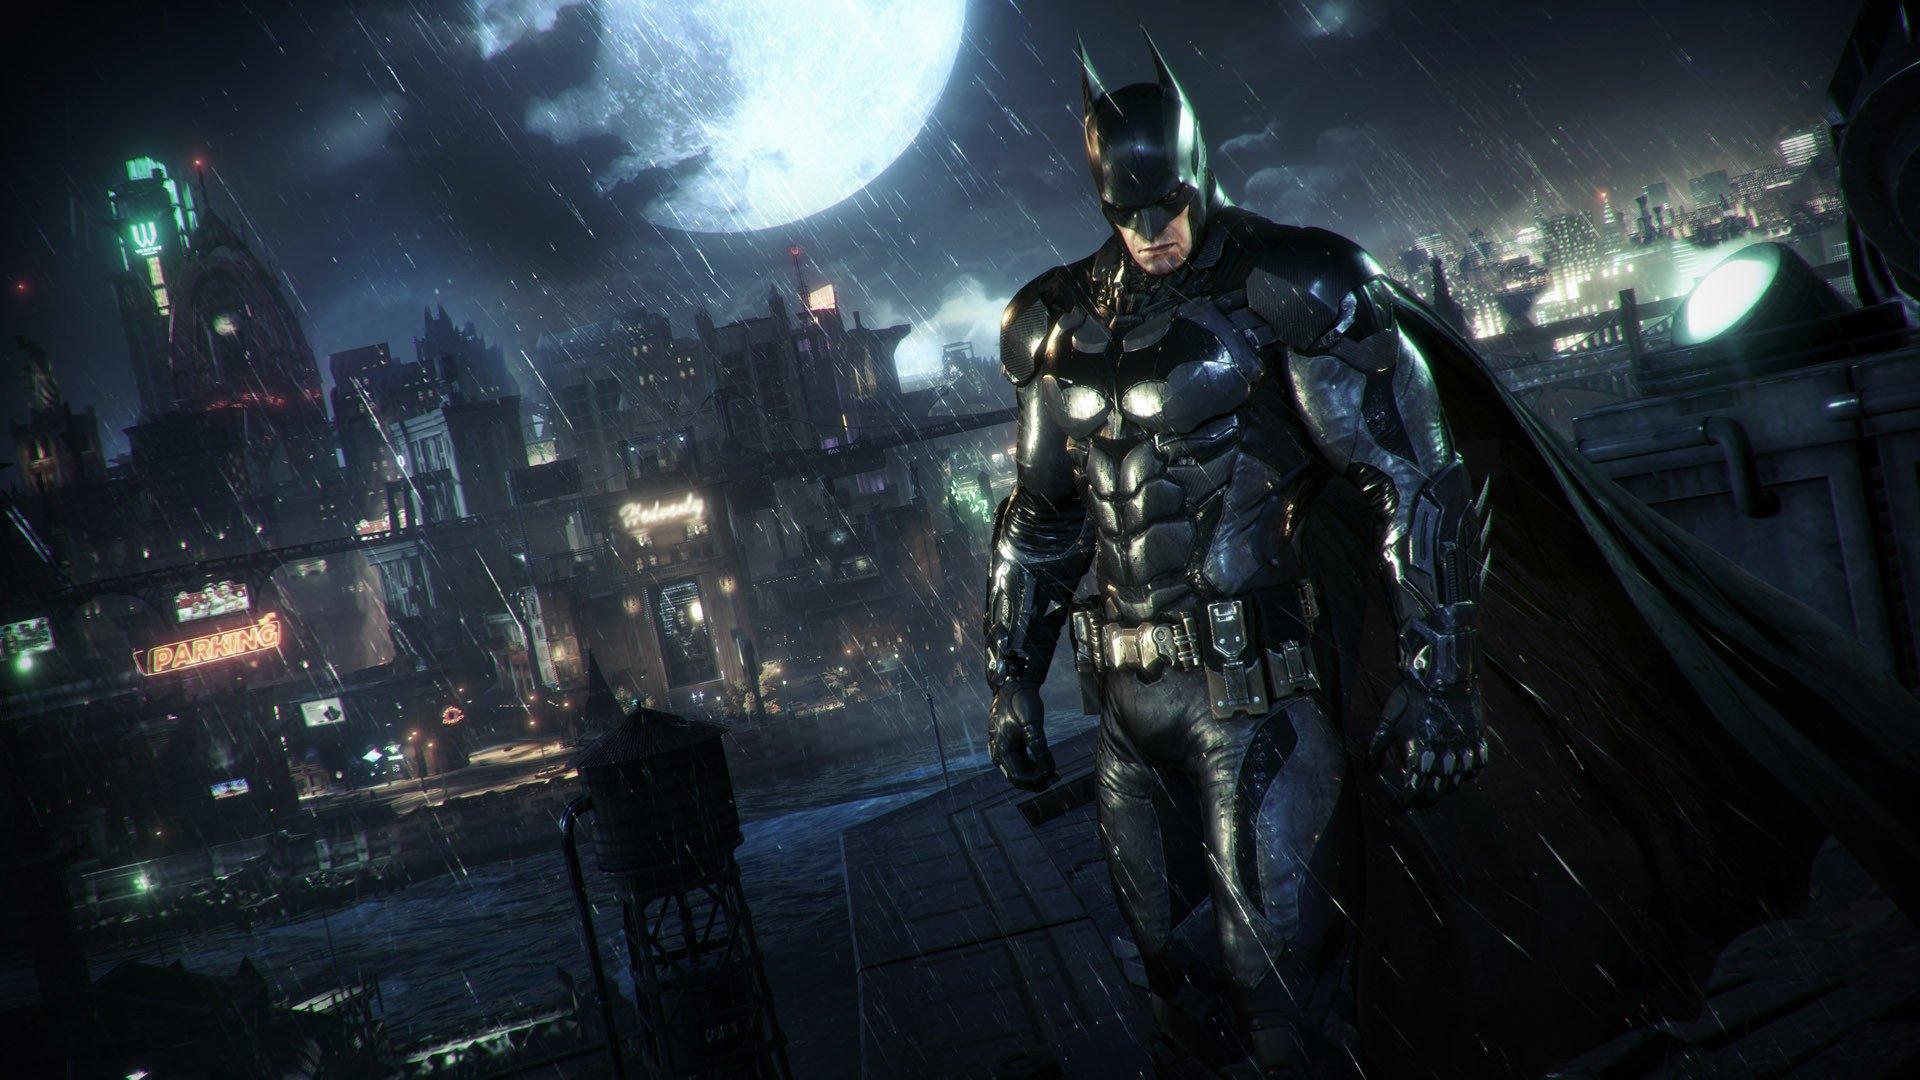 batman arkham knight wallpaper 1